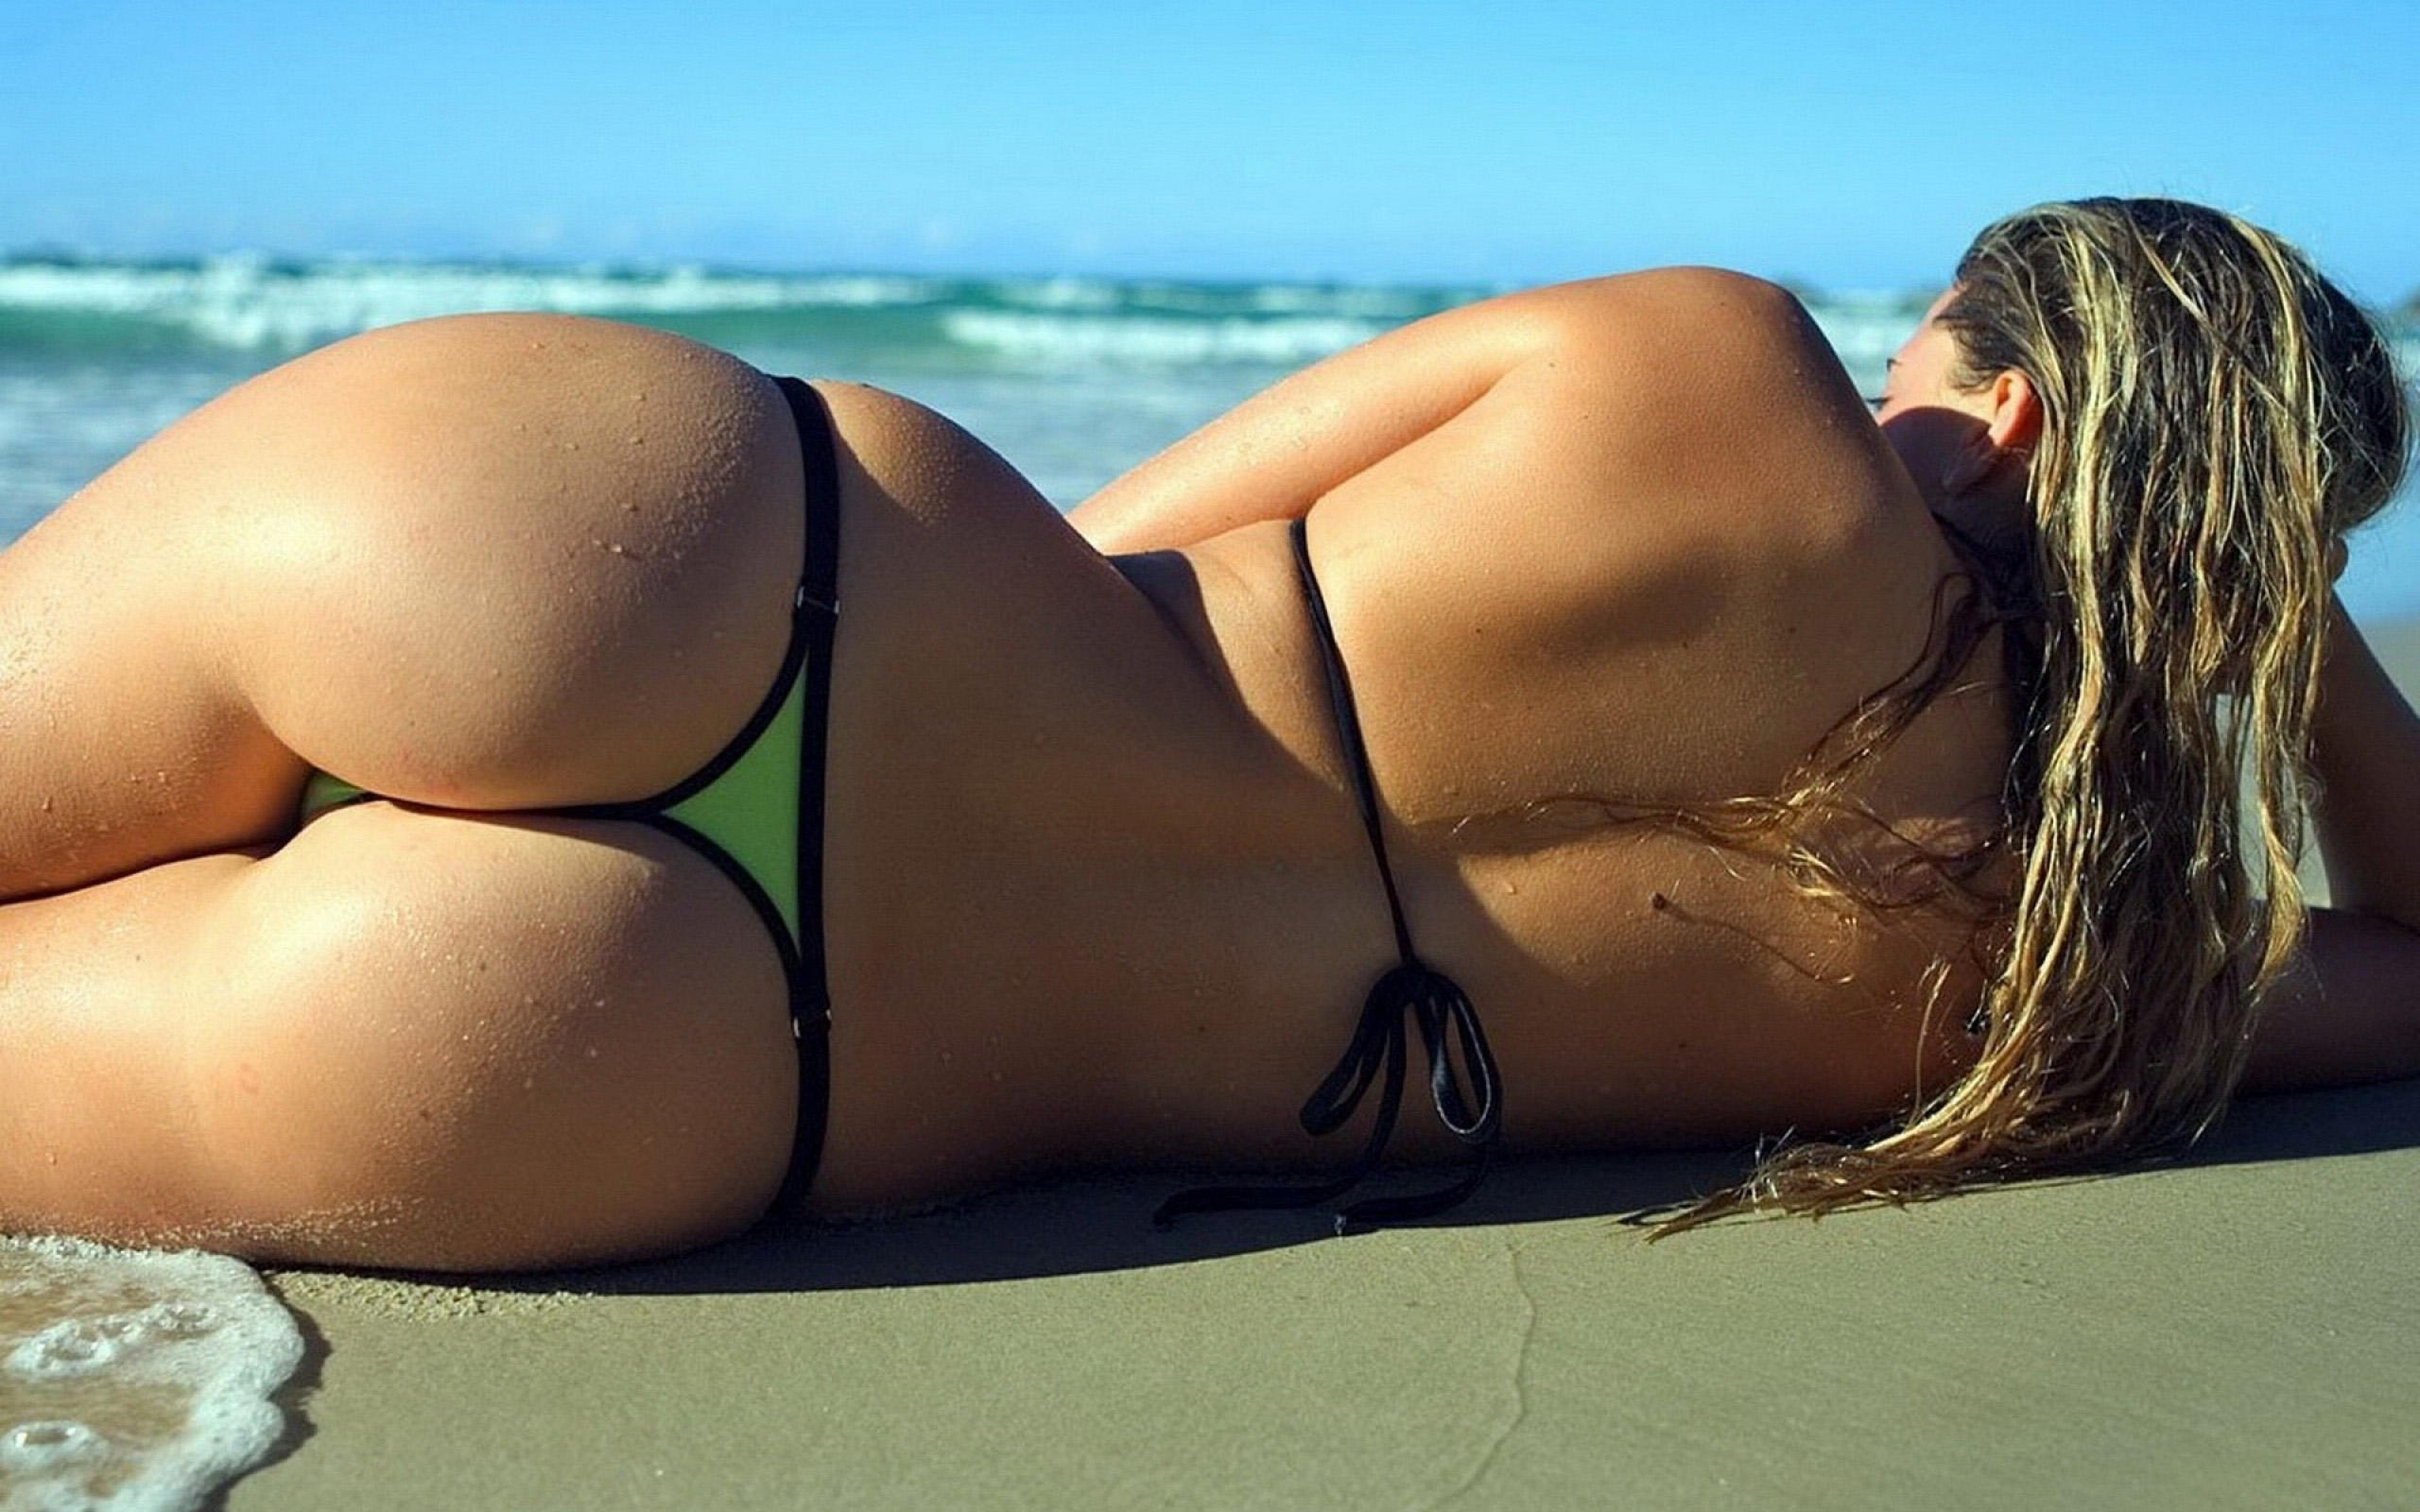 Jennifer lopez shows off her beautiful booty in skin